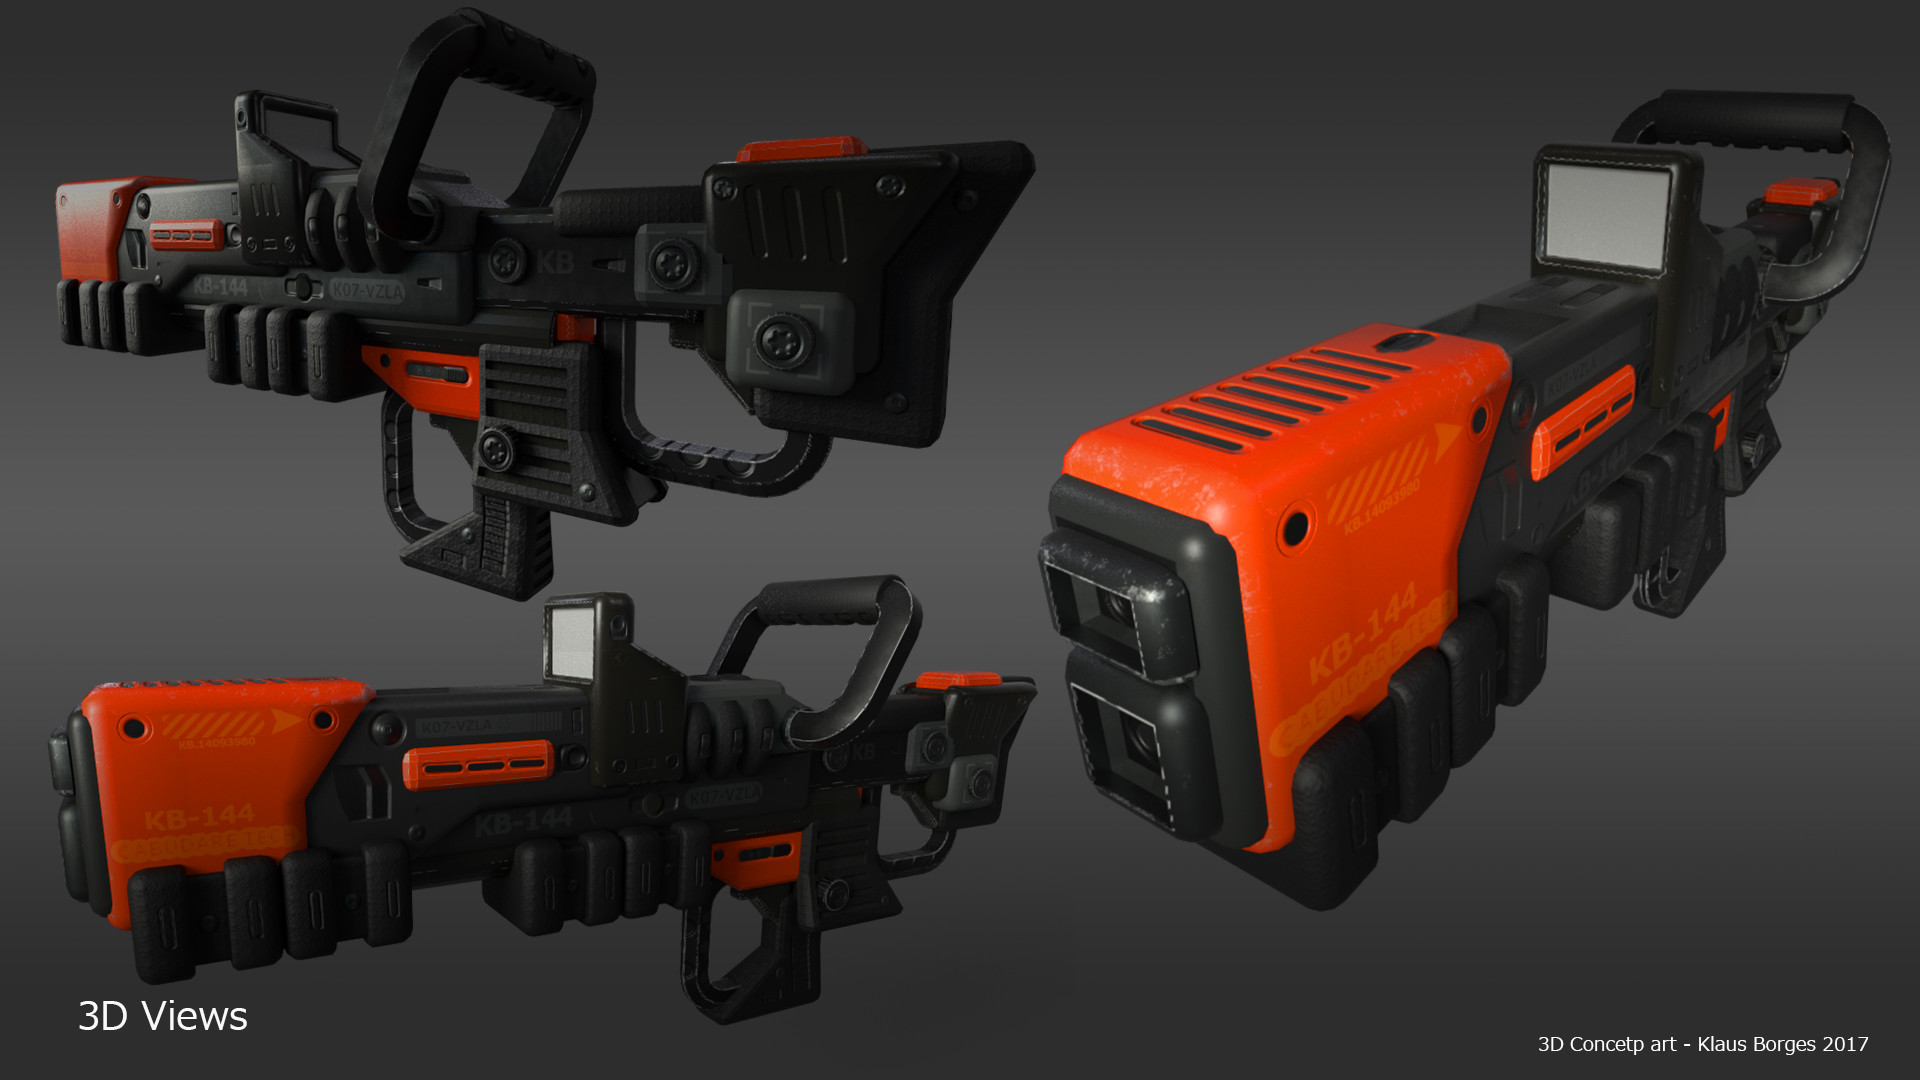 Klaus borges mockup rifle1 orange